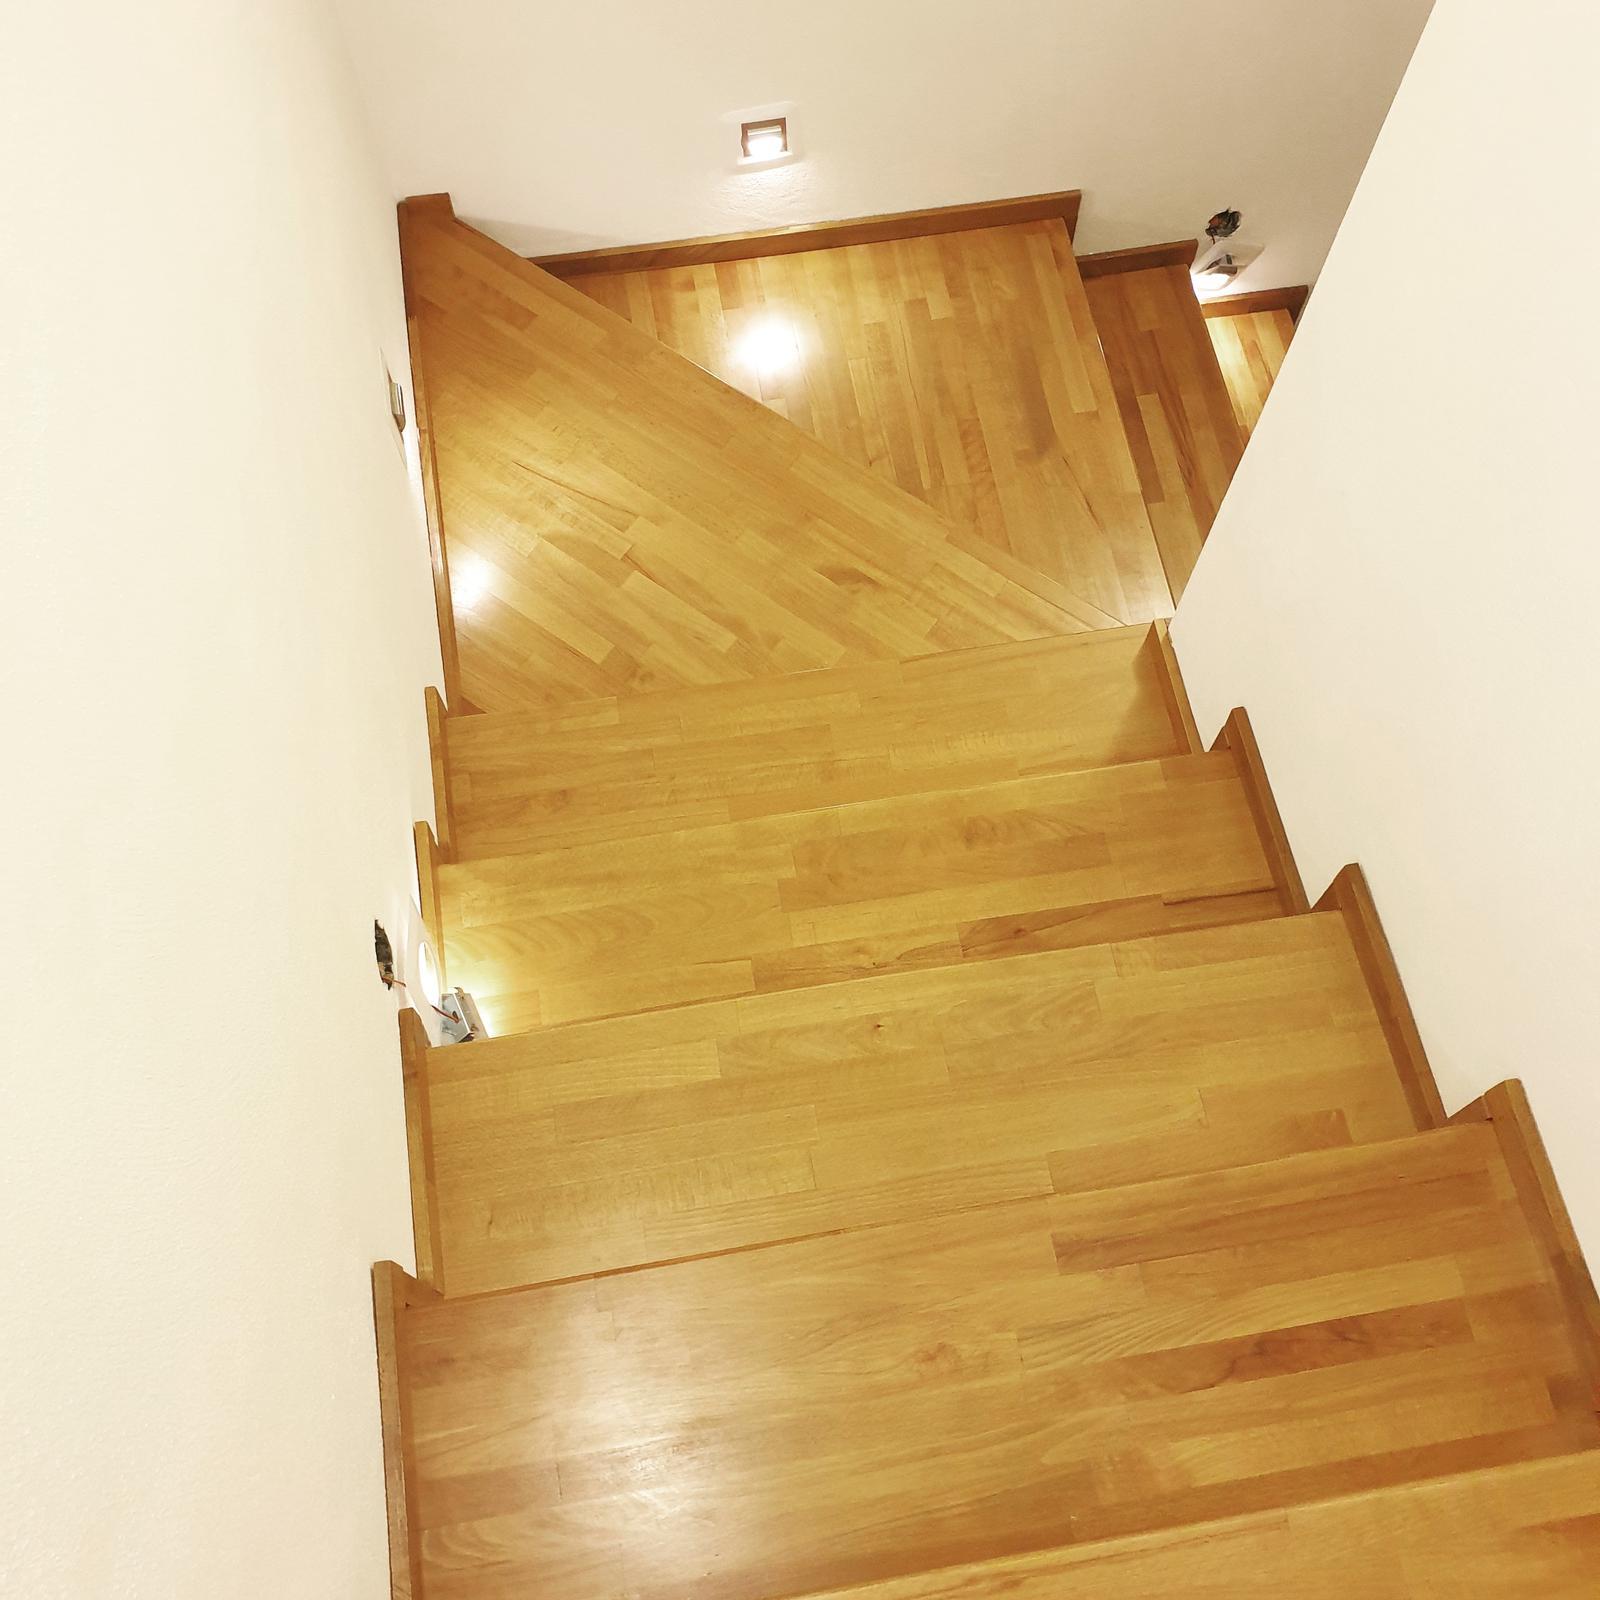 Konzolové schody - BUK, DUB - Obrázok č. 26